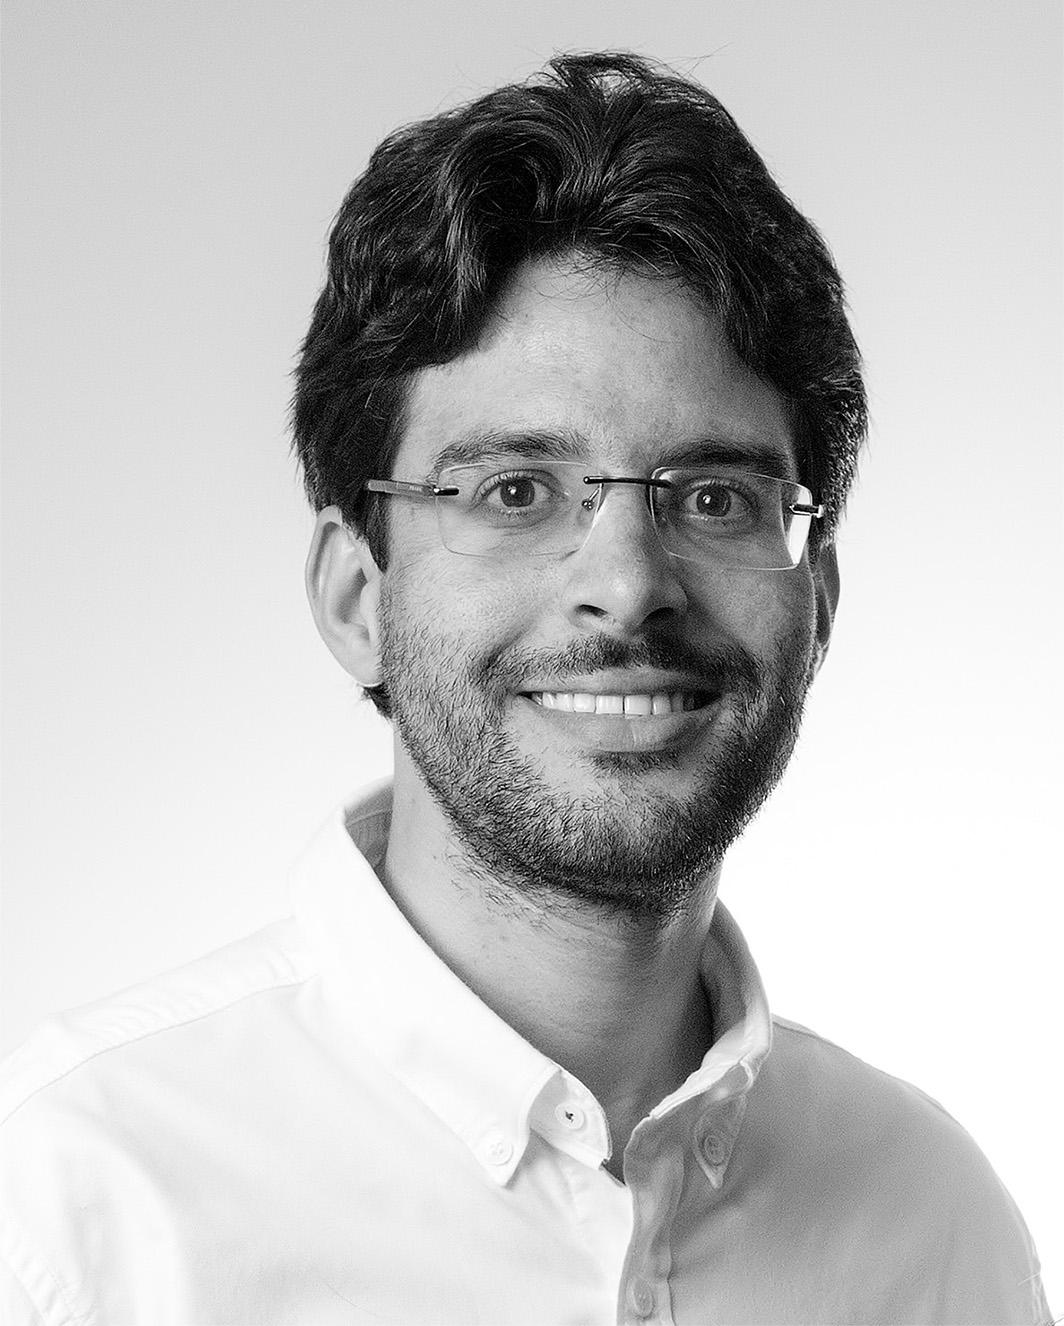 Bruno Calazans